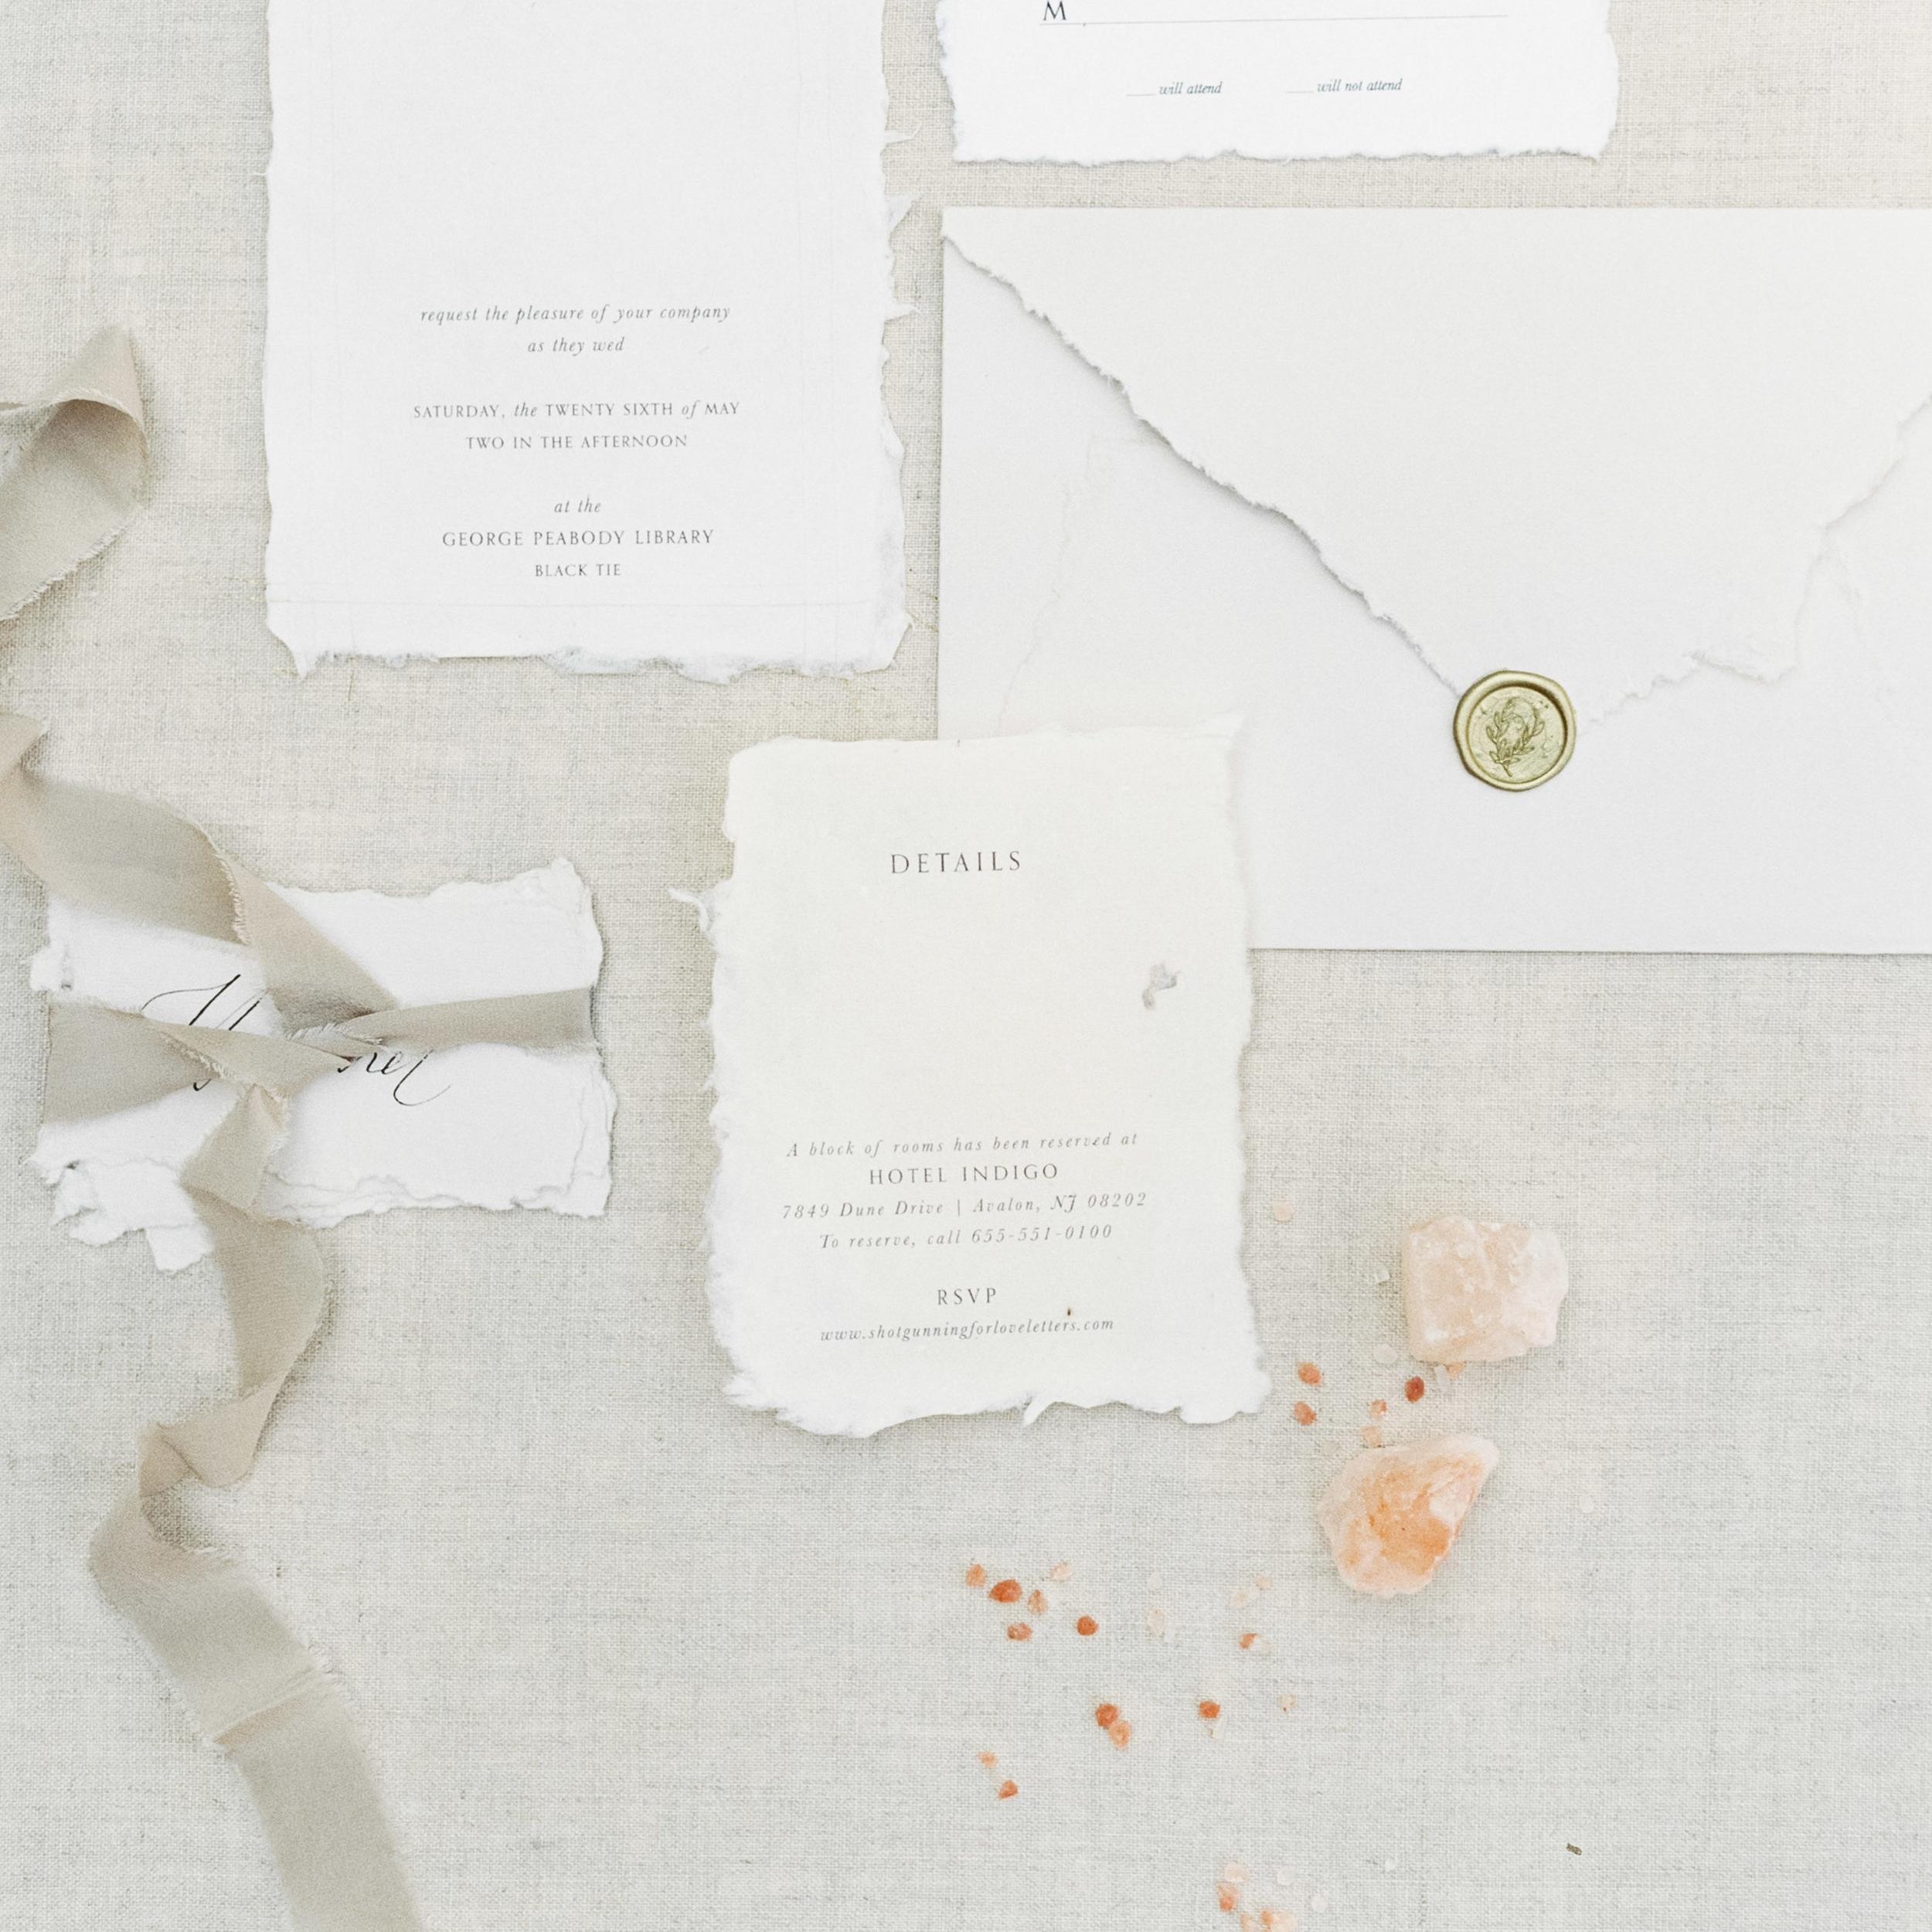 Silk Ribbon - Semi Custom Calligraphy Wedding Invitations | Shotgunning for Love Letters, Baltimore, MD